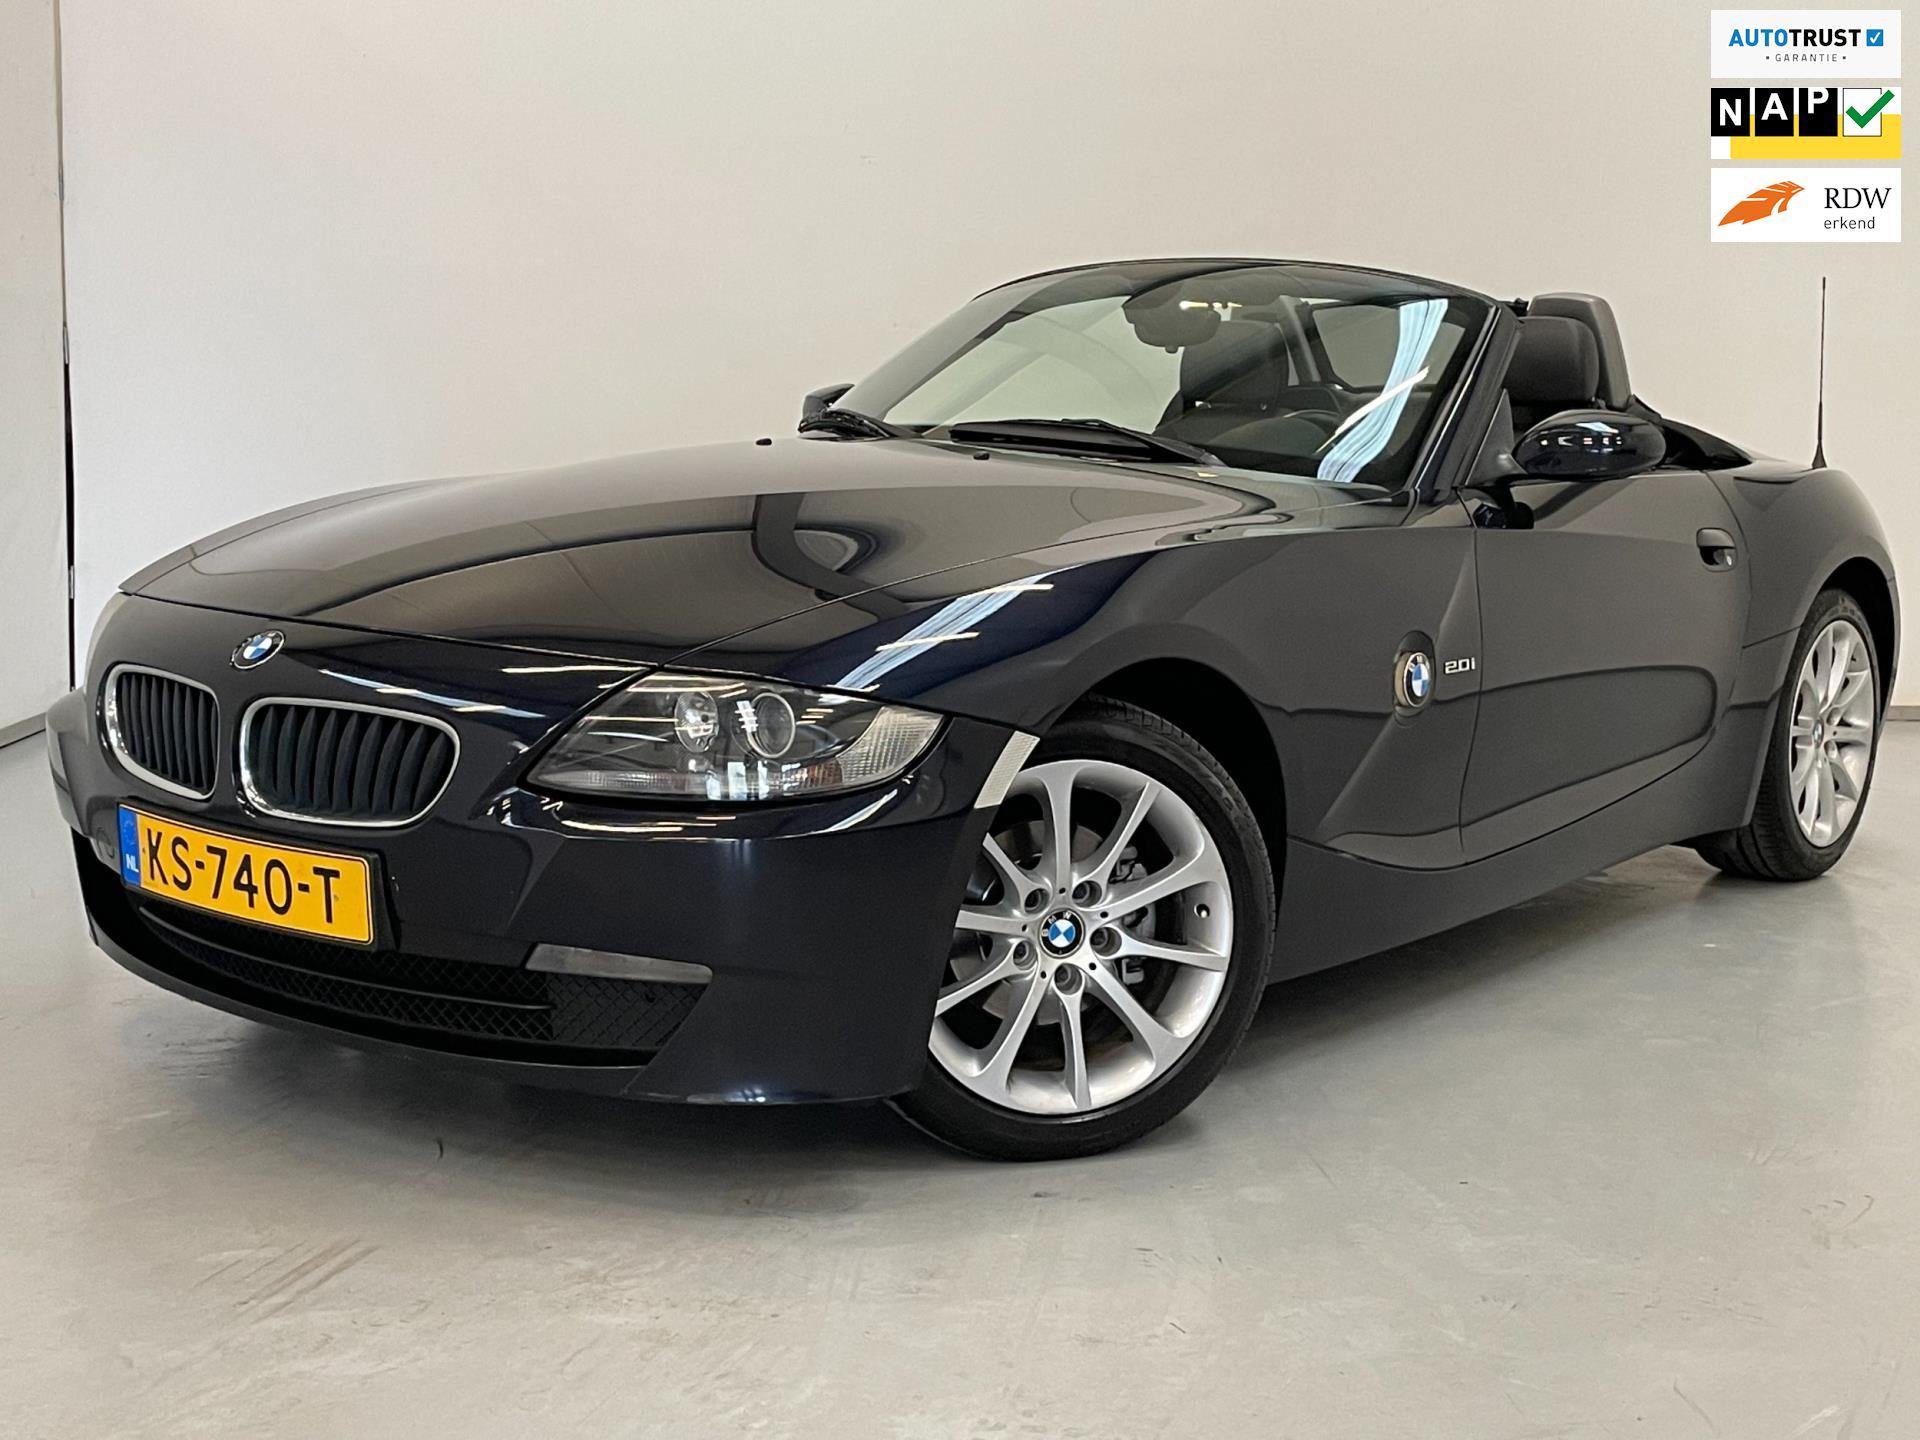 BMW Z4 Roadster occasion - Van den Brink Auto's